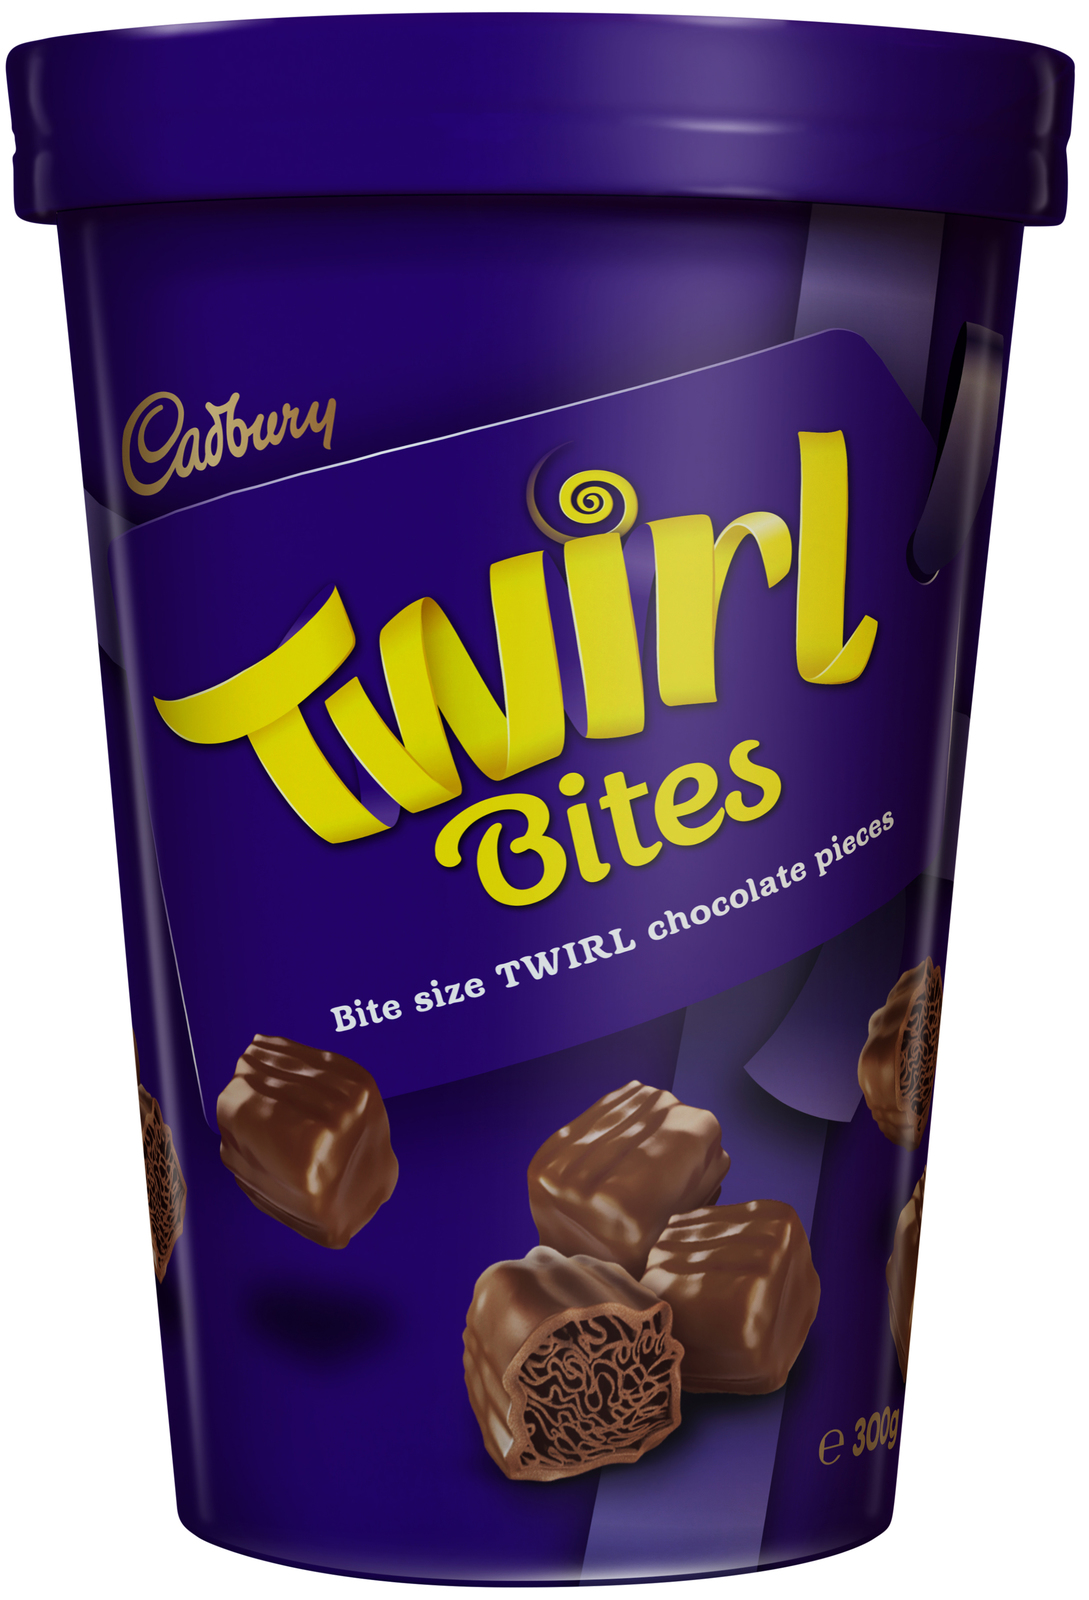 Cadbury: Twirl Bites (300g) image